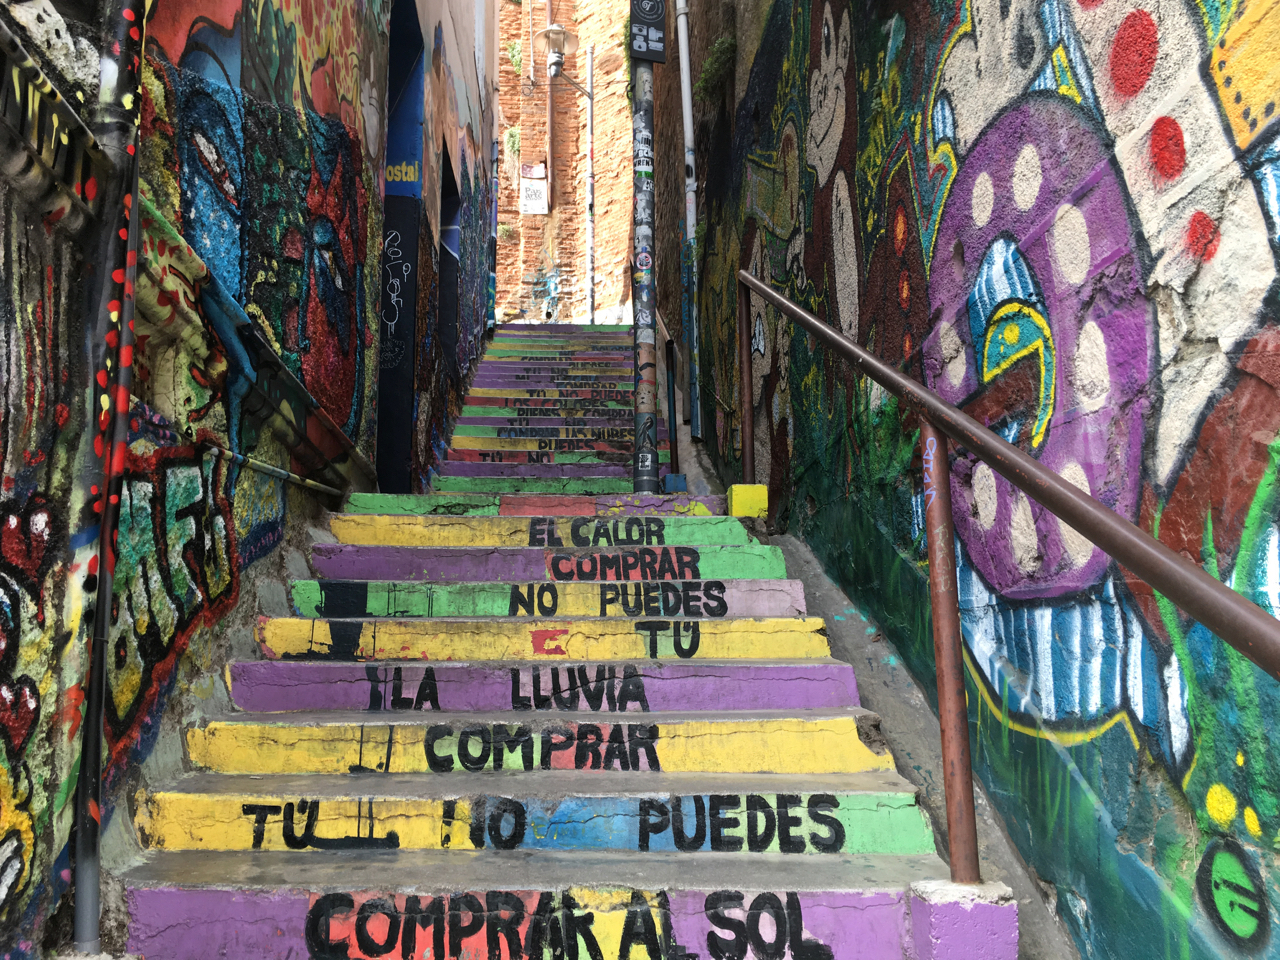 Chile_Valparaisograffiti13